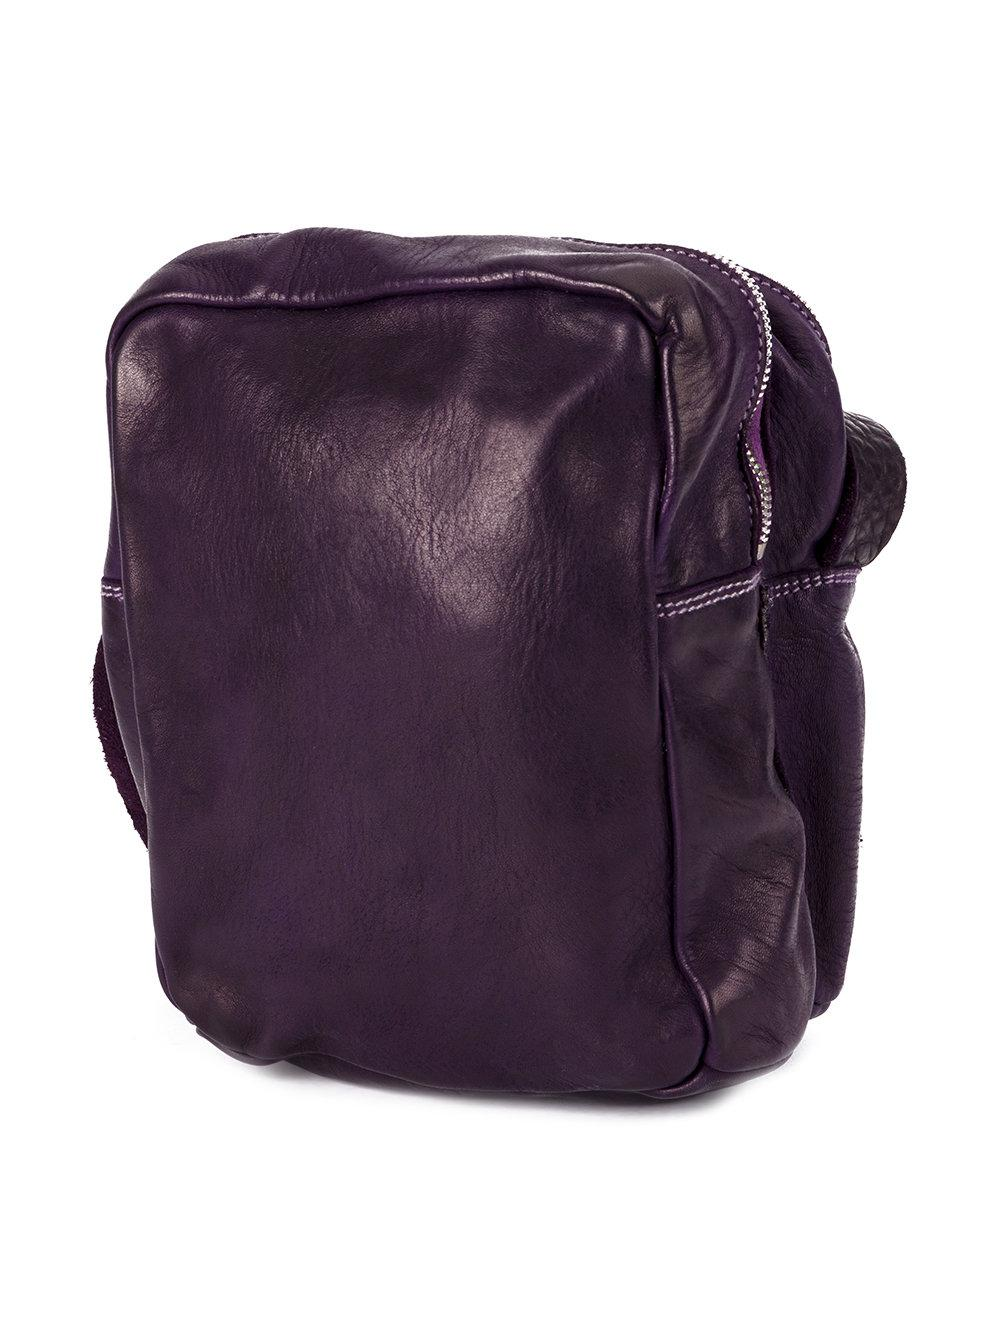 rosa púrpura Bolsa Guidi hombro y multifuncional de IqpYxBO